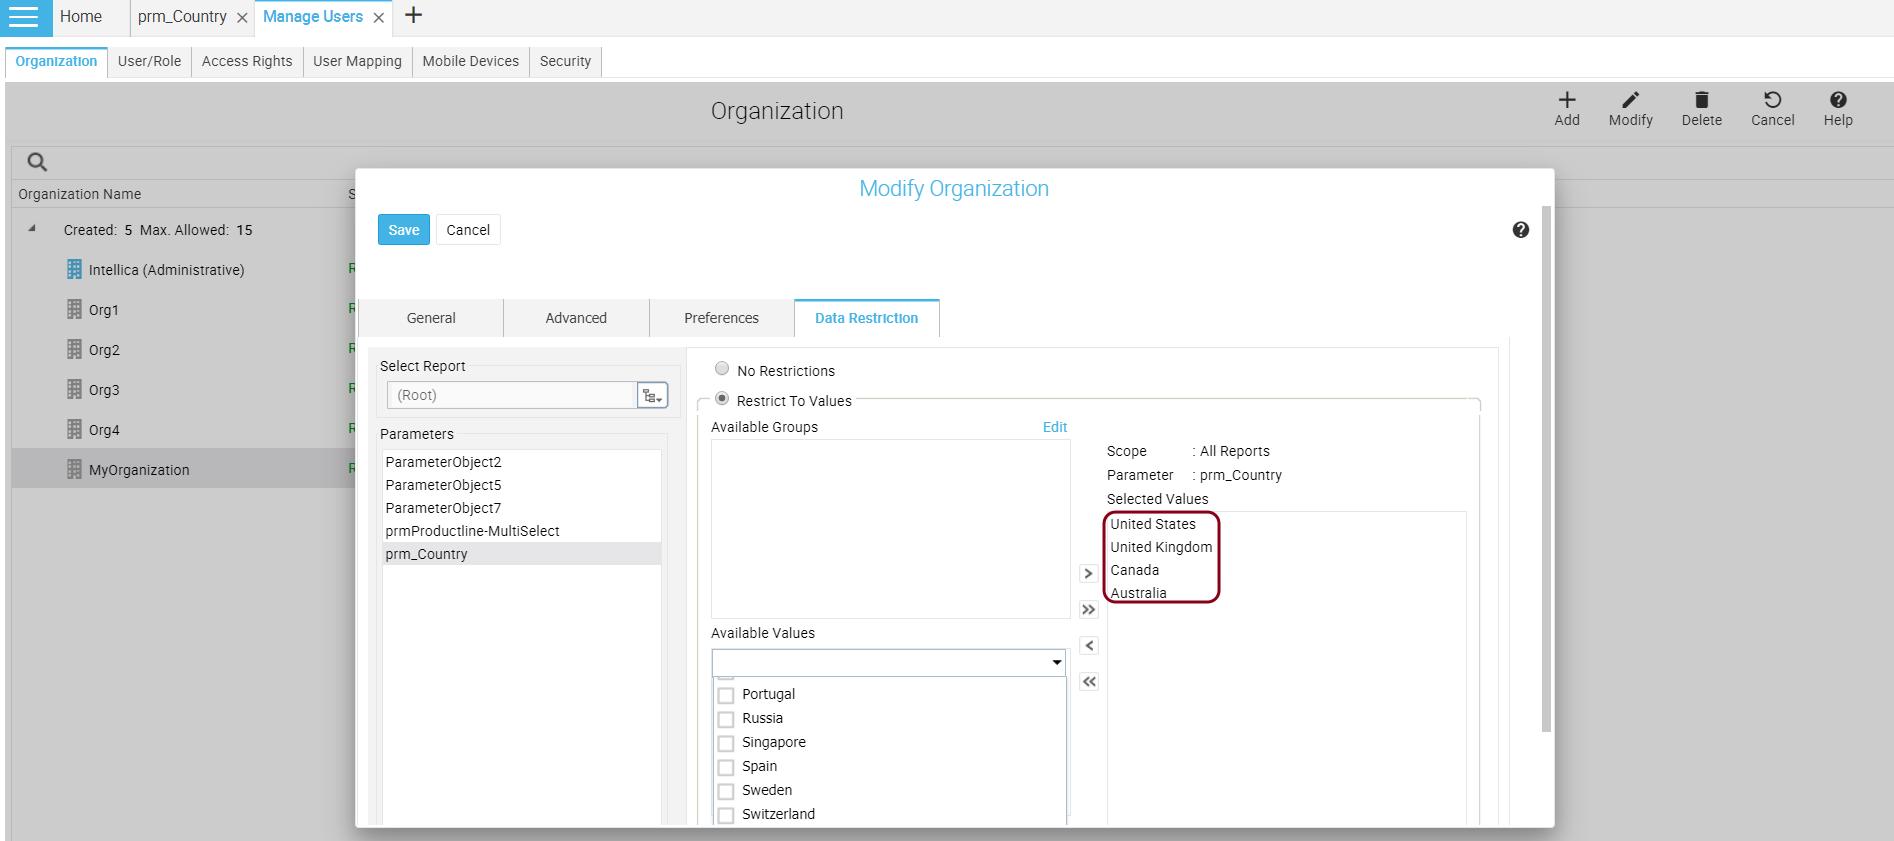 Data Restriction on Organization